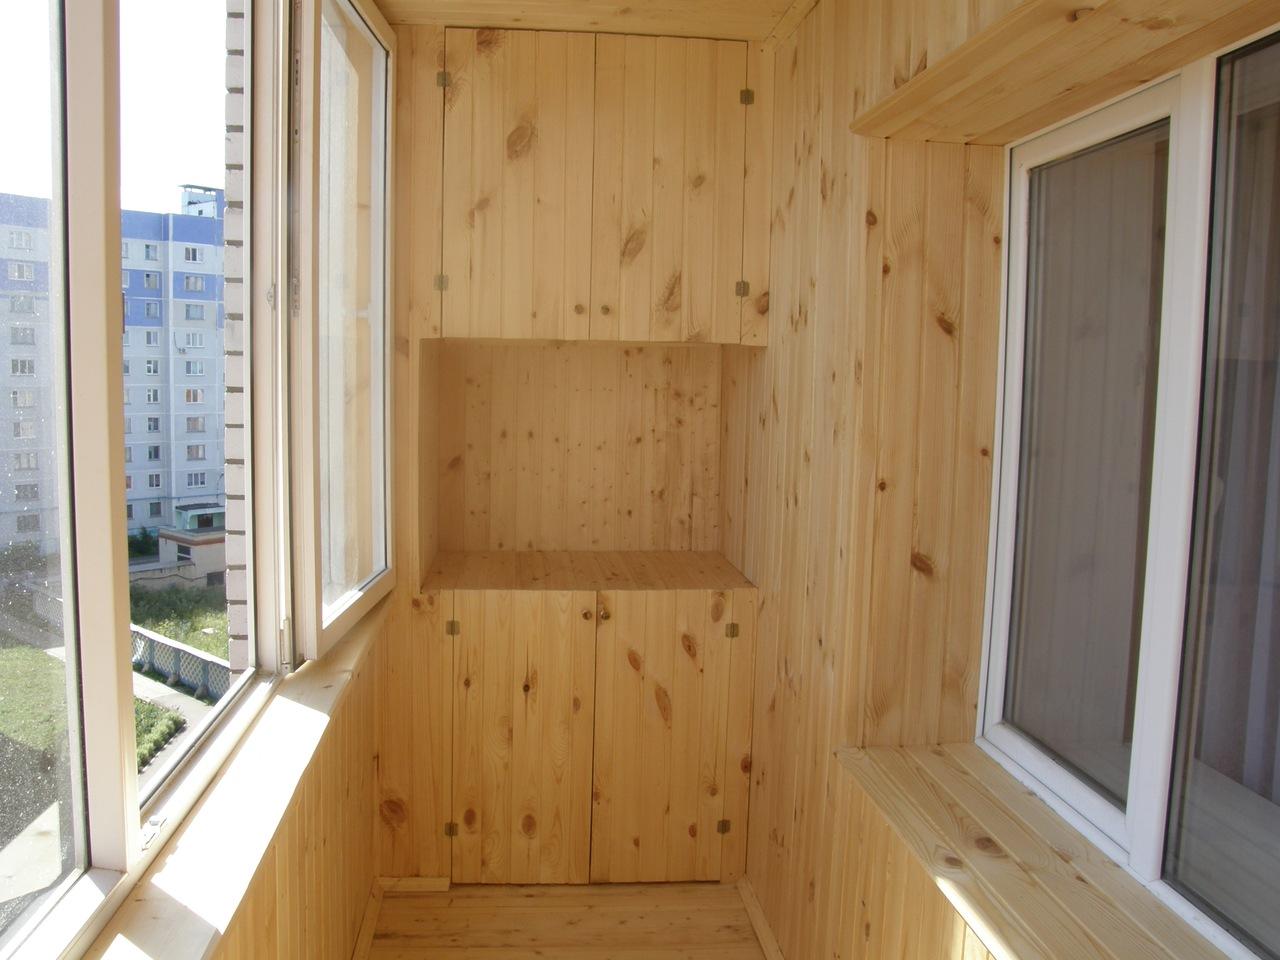 Вагонка из дерева на балконе